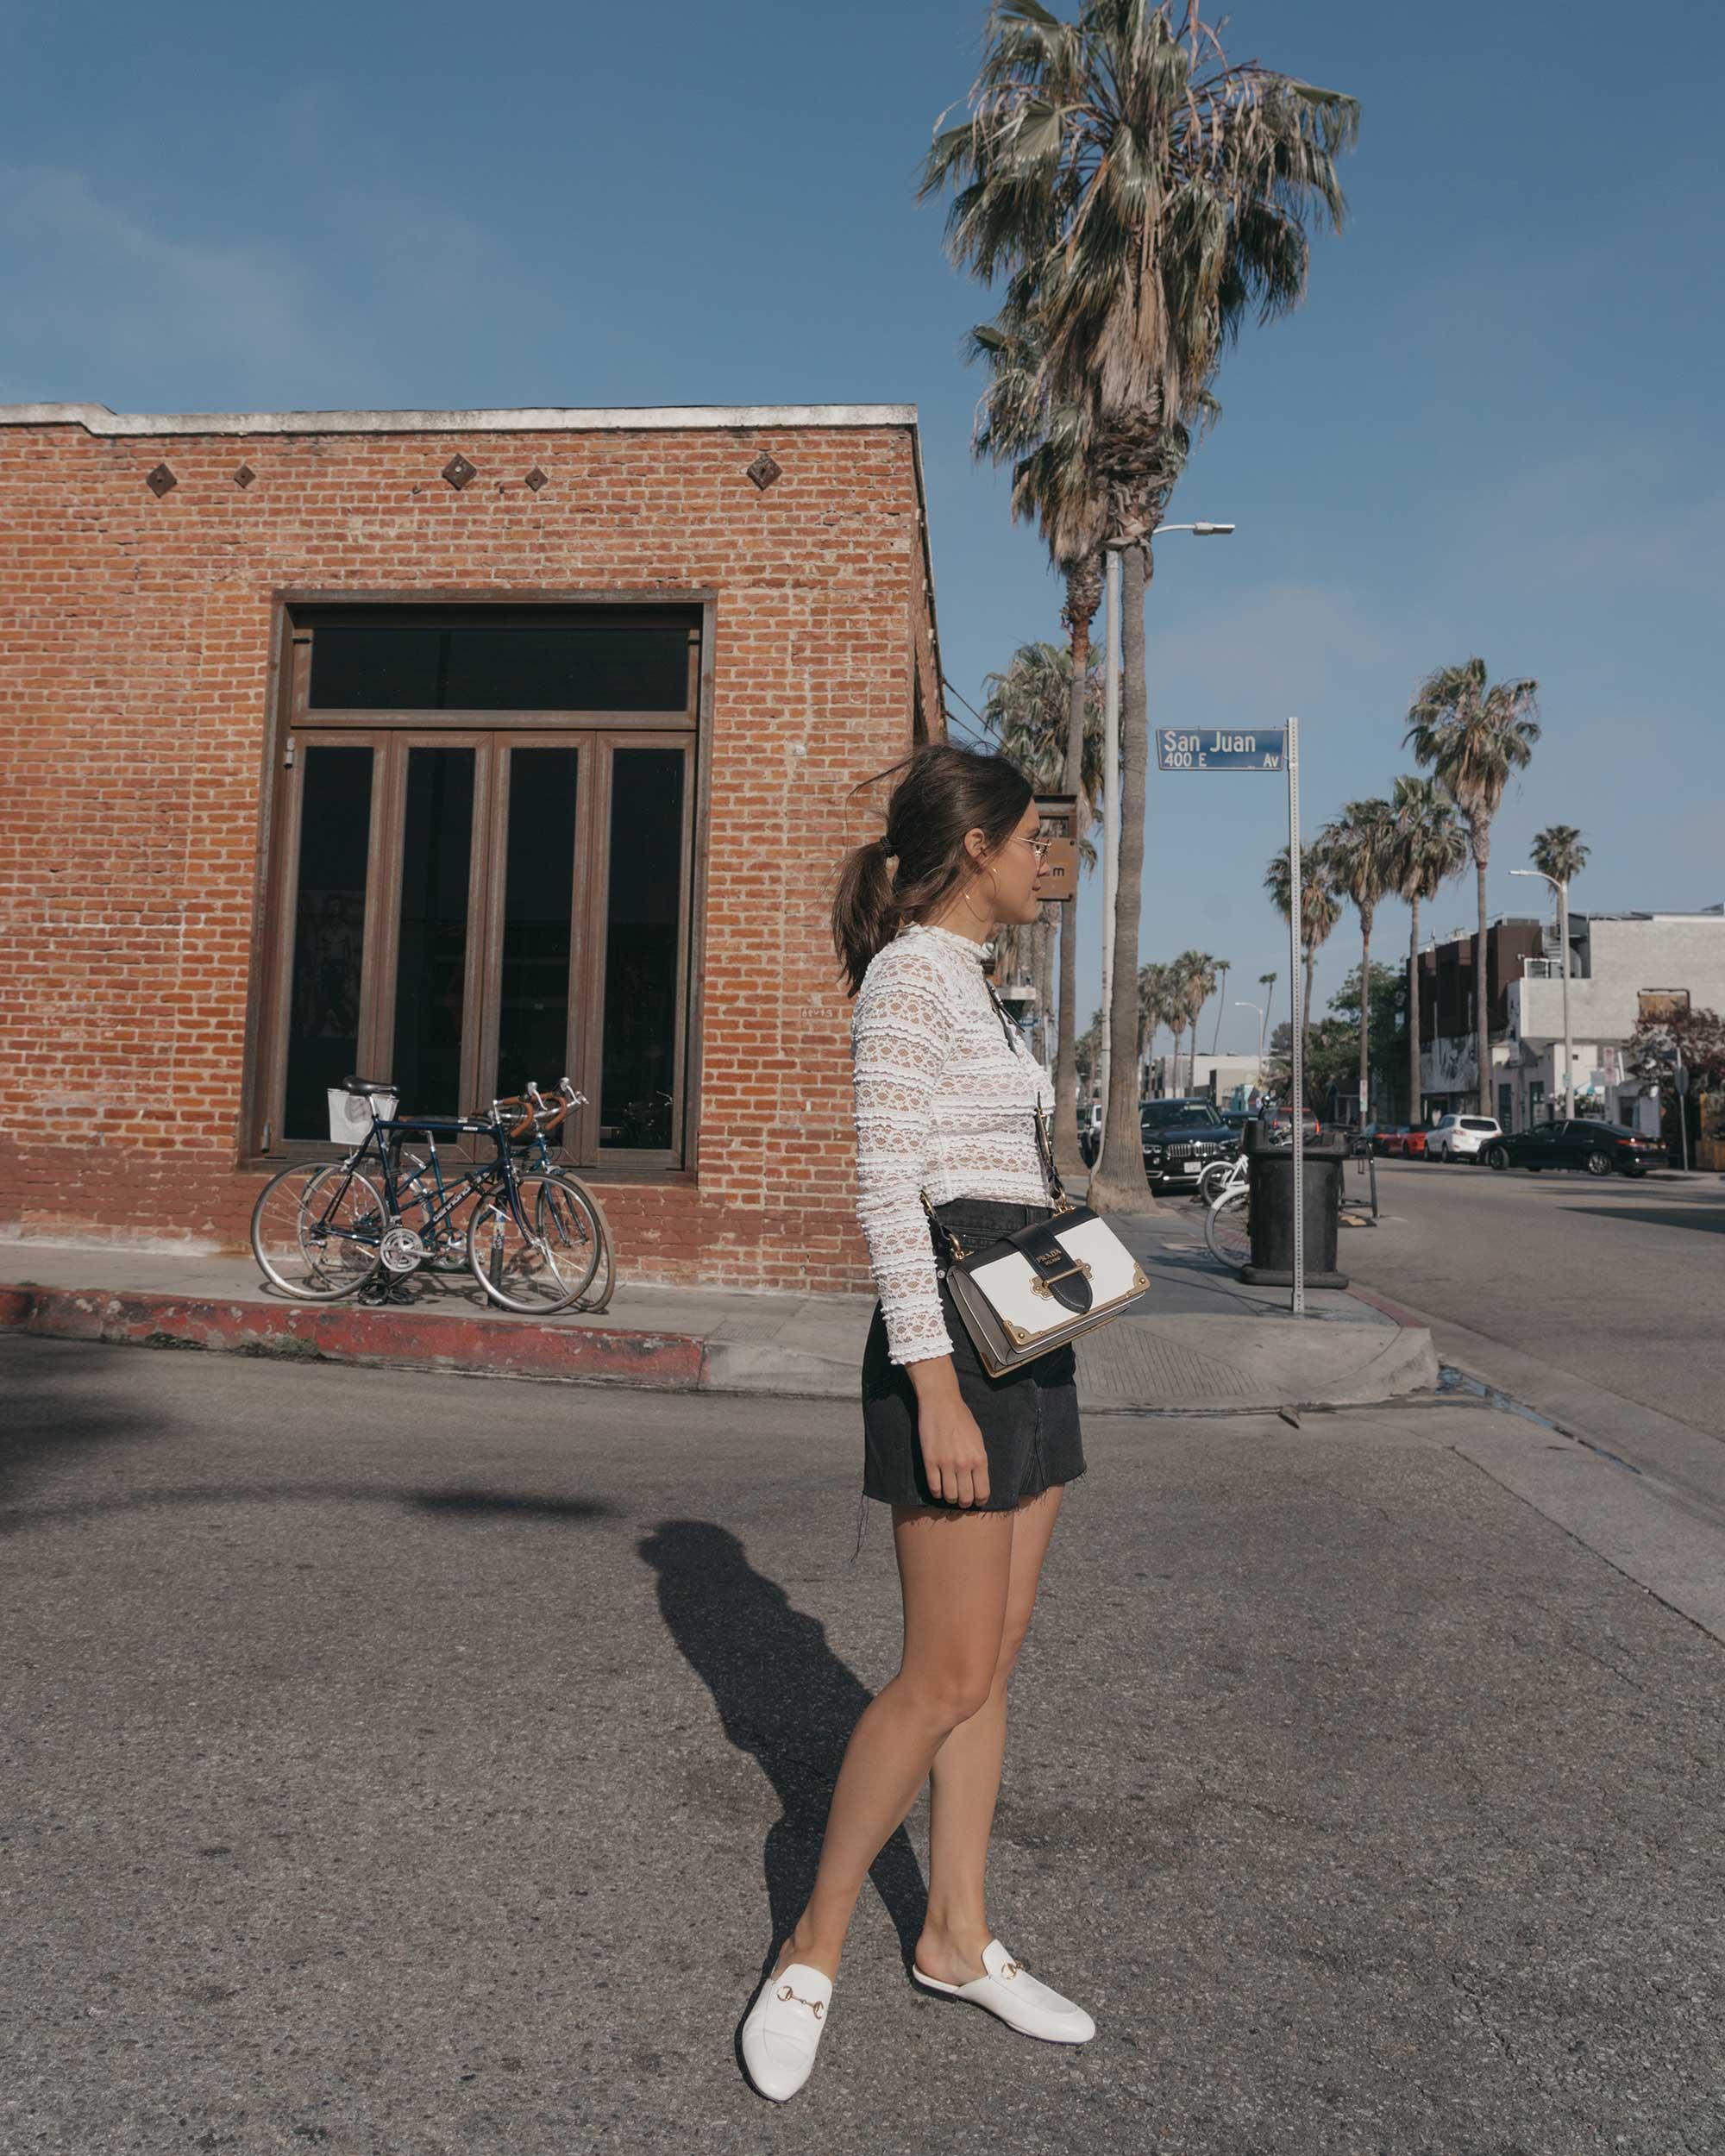 Prada City Saffiano Leather Cahier Bag, Black Denim Skirt, Summer outfit, Abbot Kinney California1.jpg